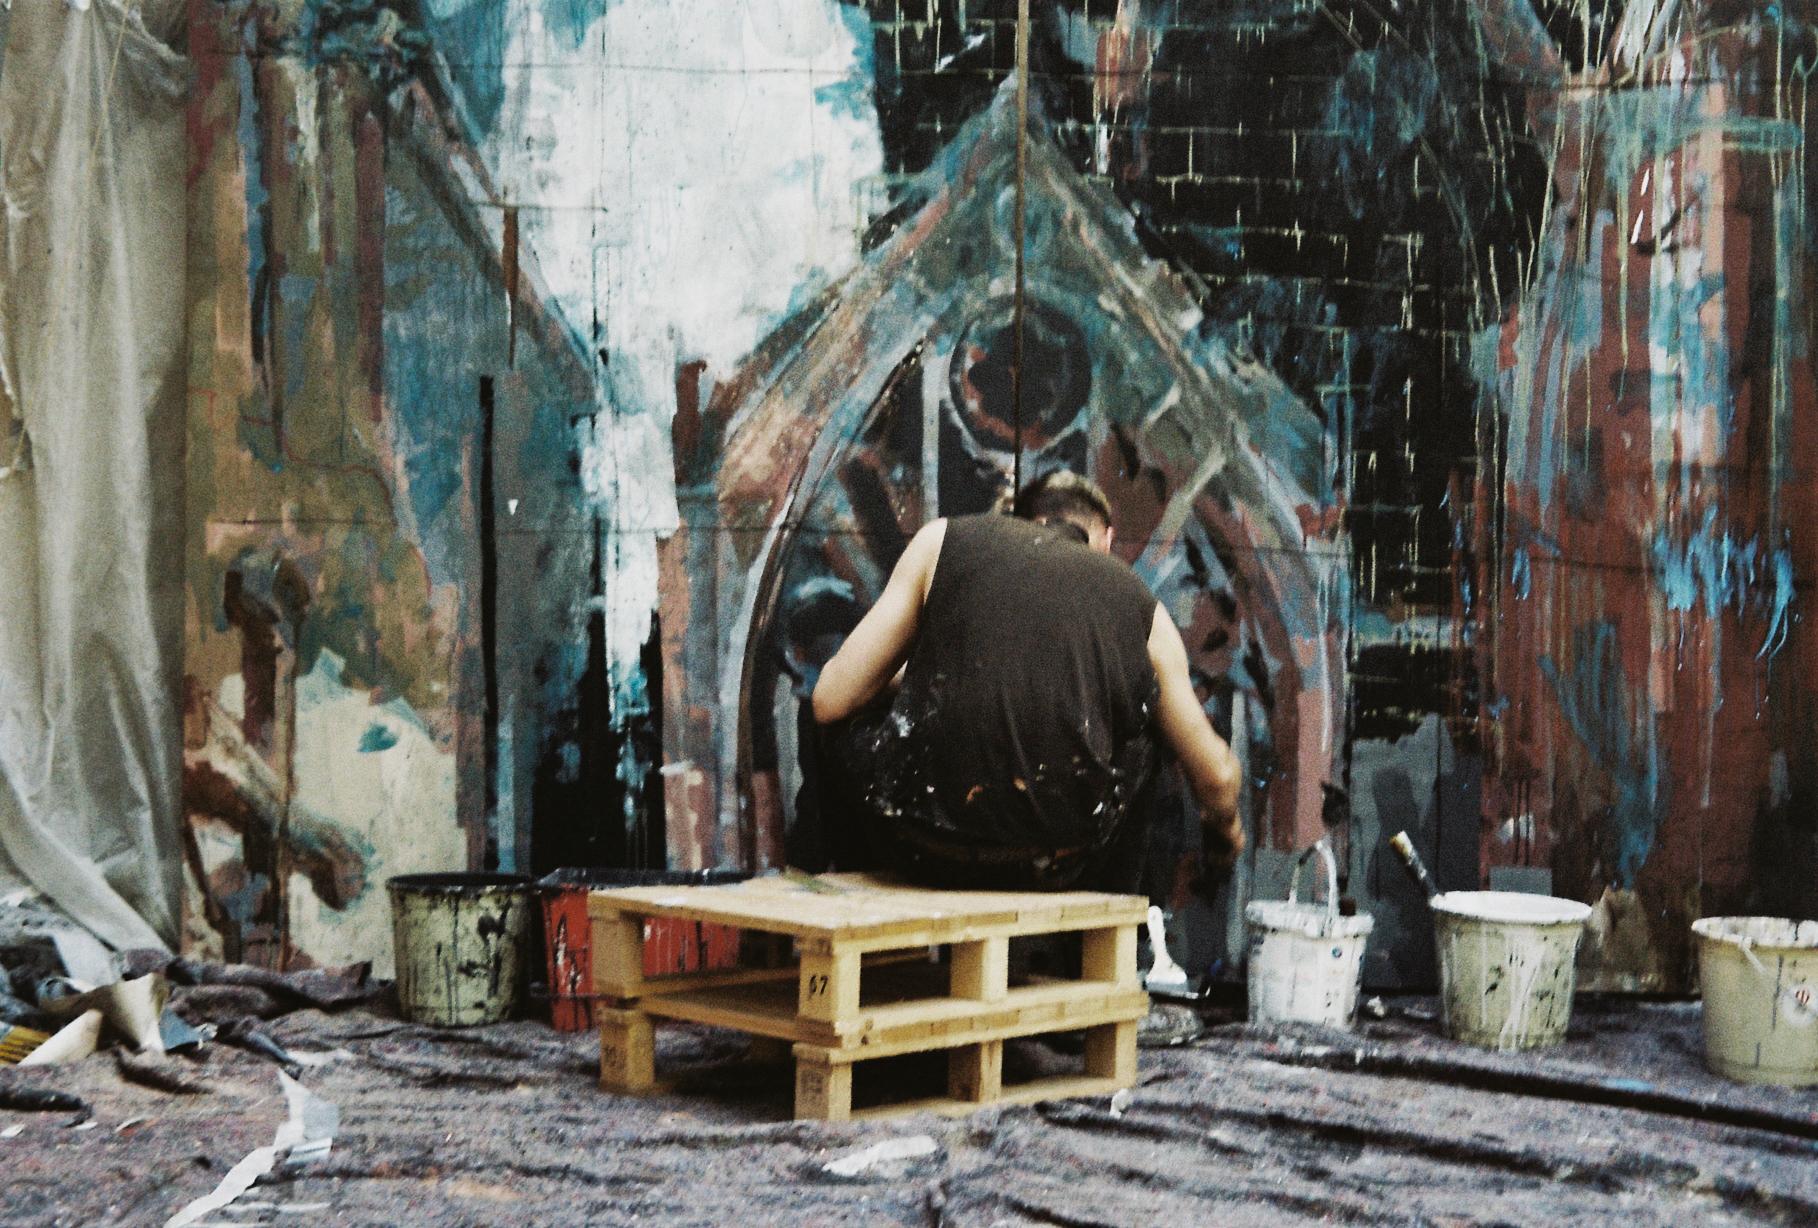 Merci exhibition by Gonzalo Borondo